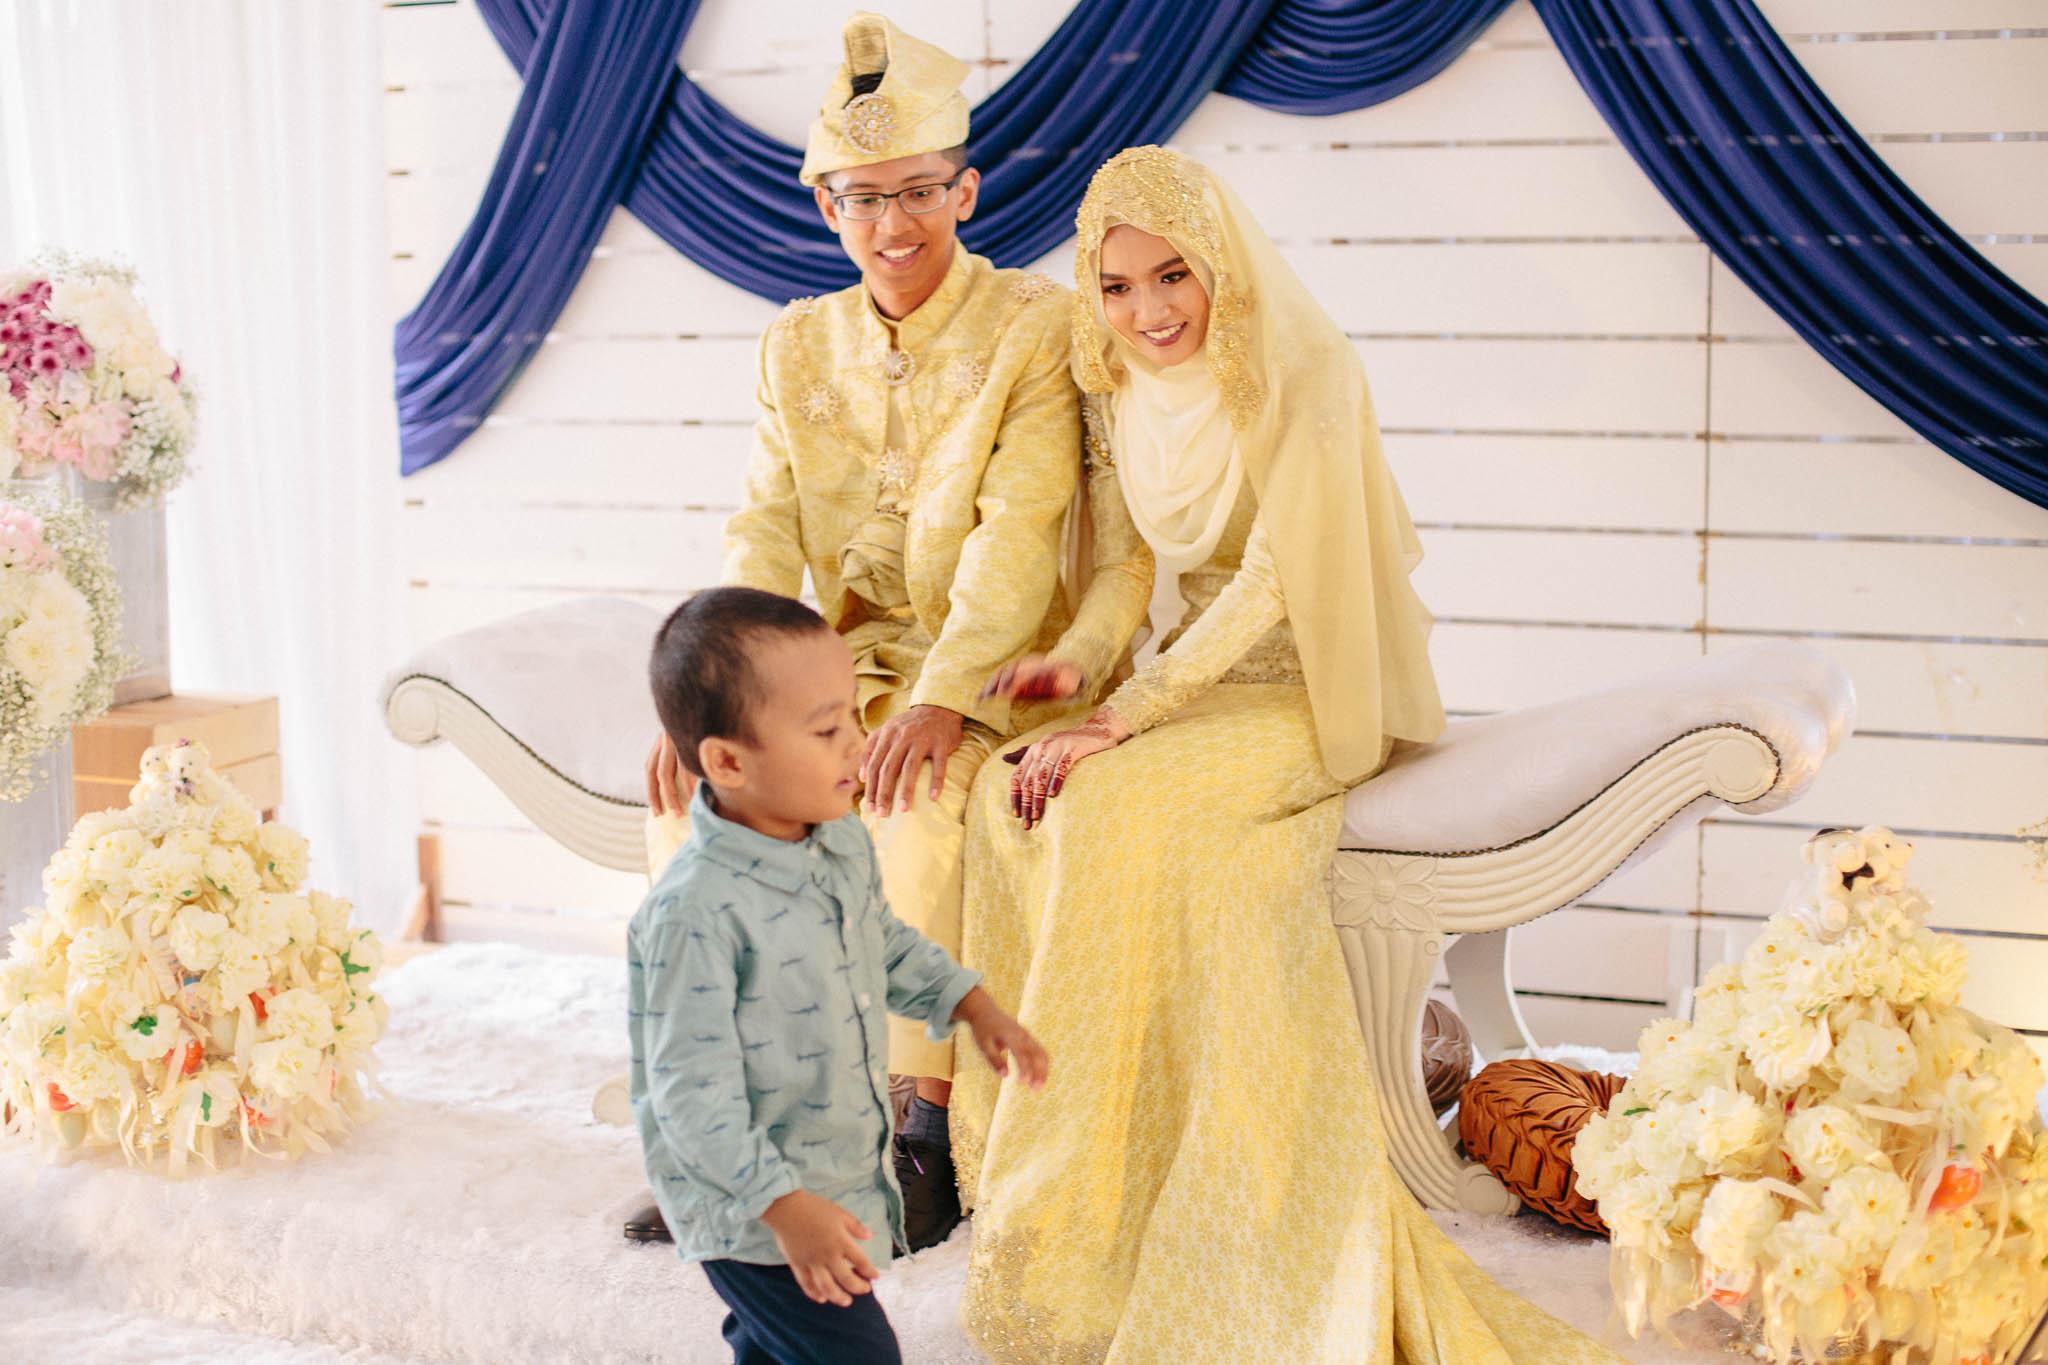 singapore-wedding-photographer-sharalyn-syazwan-047.jpg